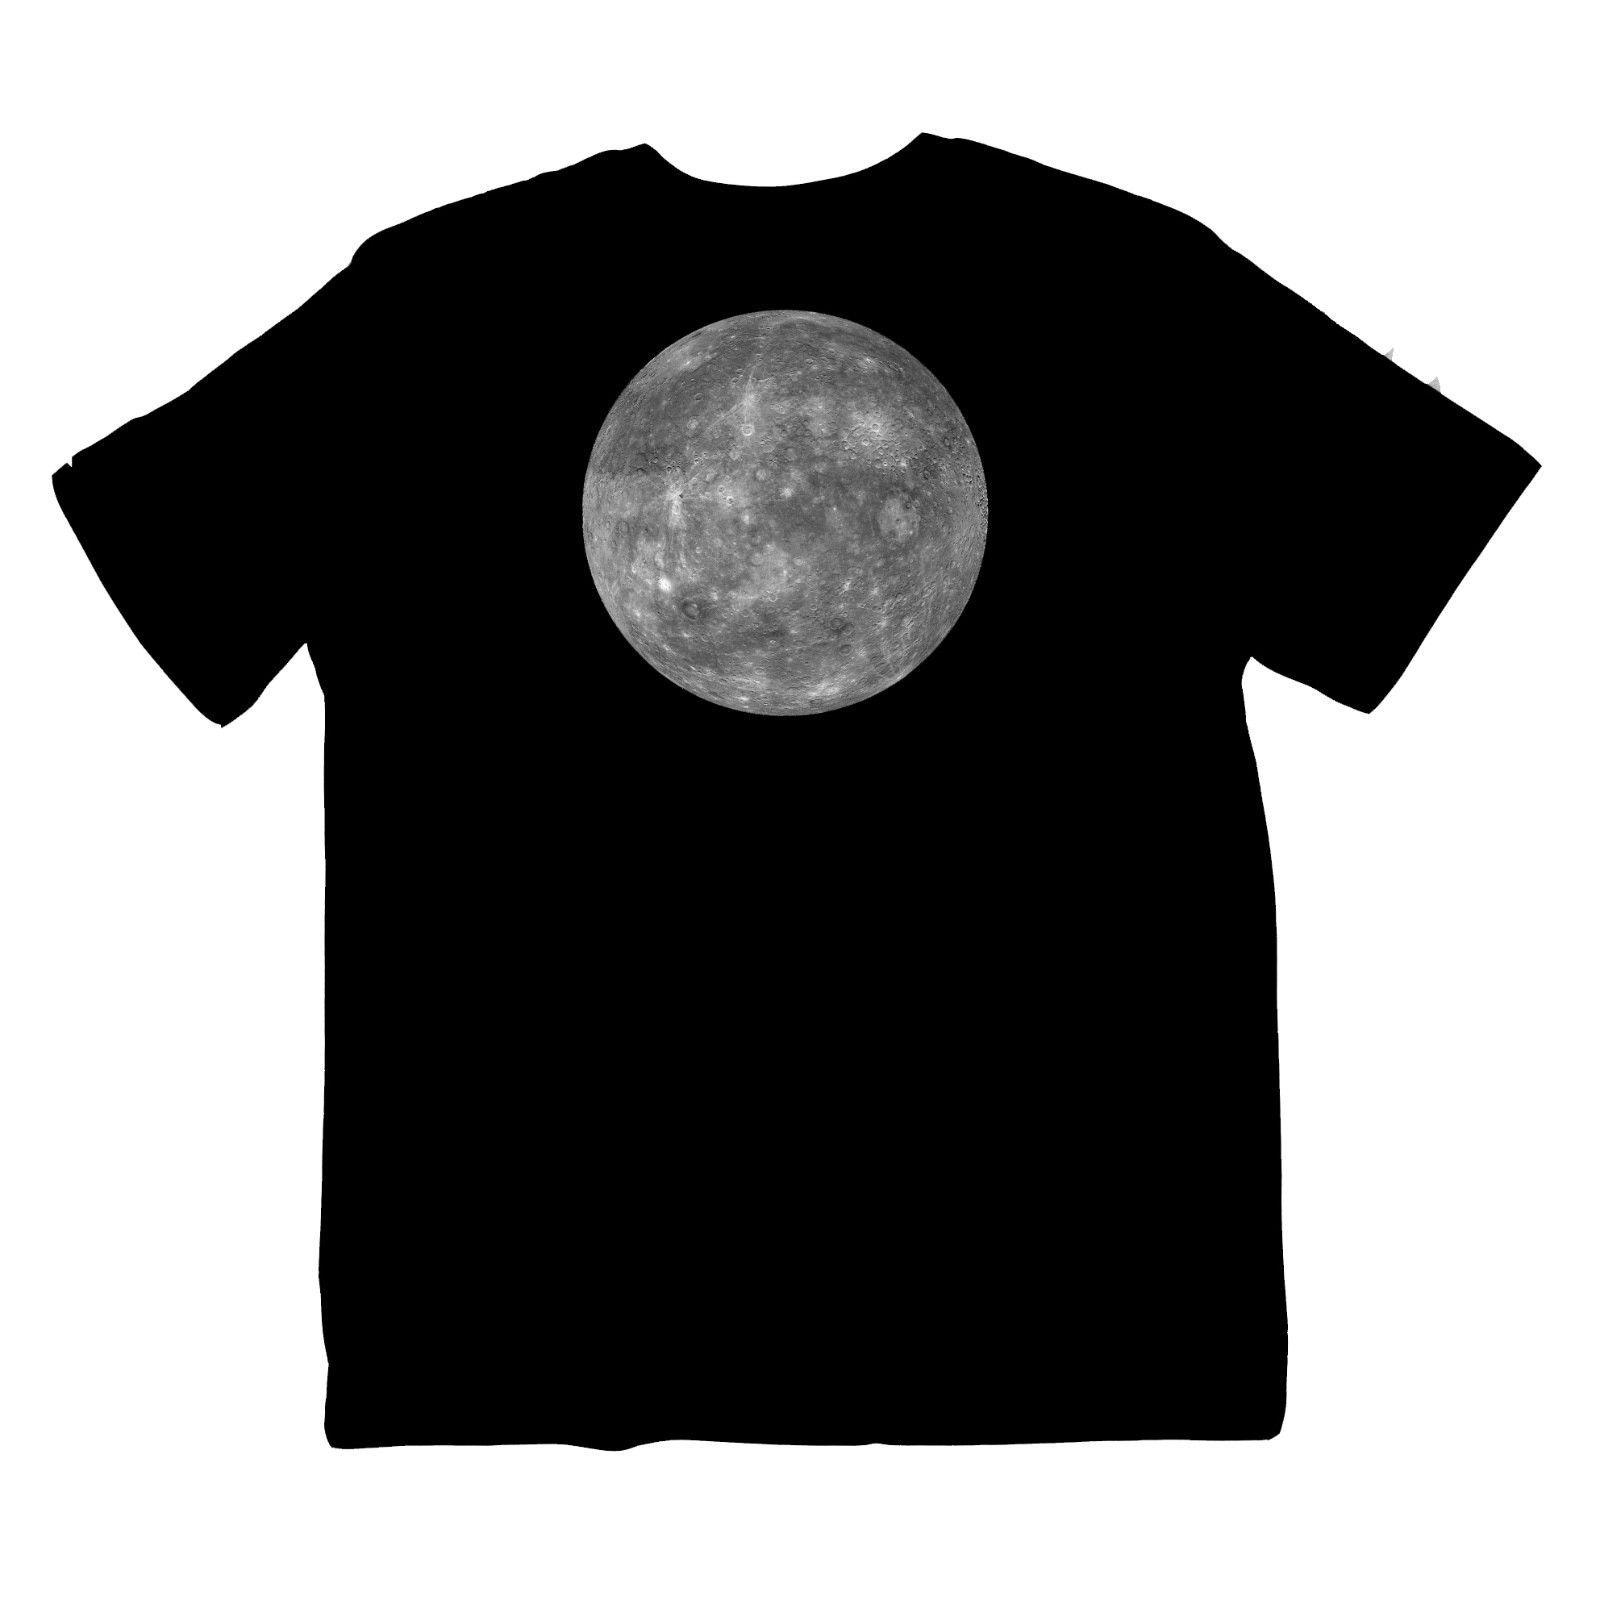 c99d3553 Motorhead 'Warpig' Vintage Look T Shirt NEW & OFFICIAL S XXXL Designer  White T Shirt Printed T Shirts Funny From Dizzykittenstore, $11.01|  DHgate.Com